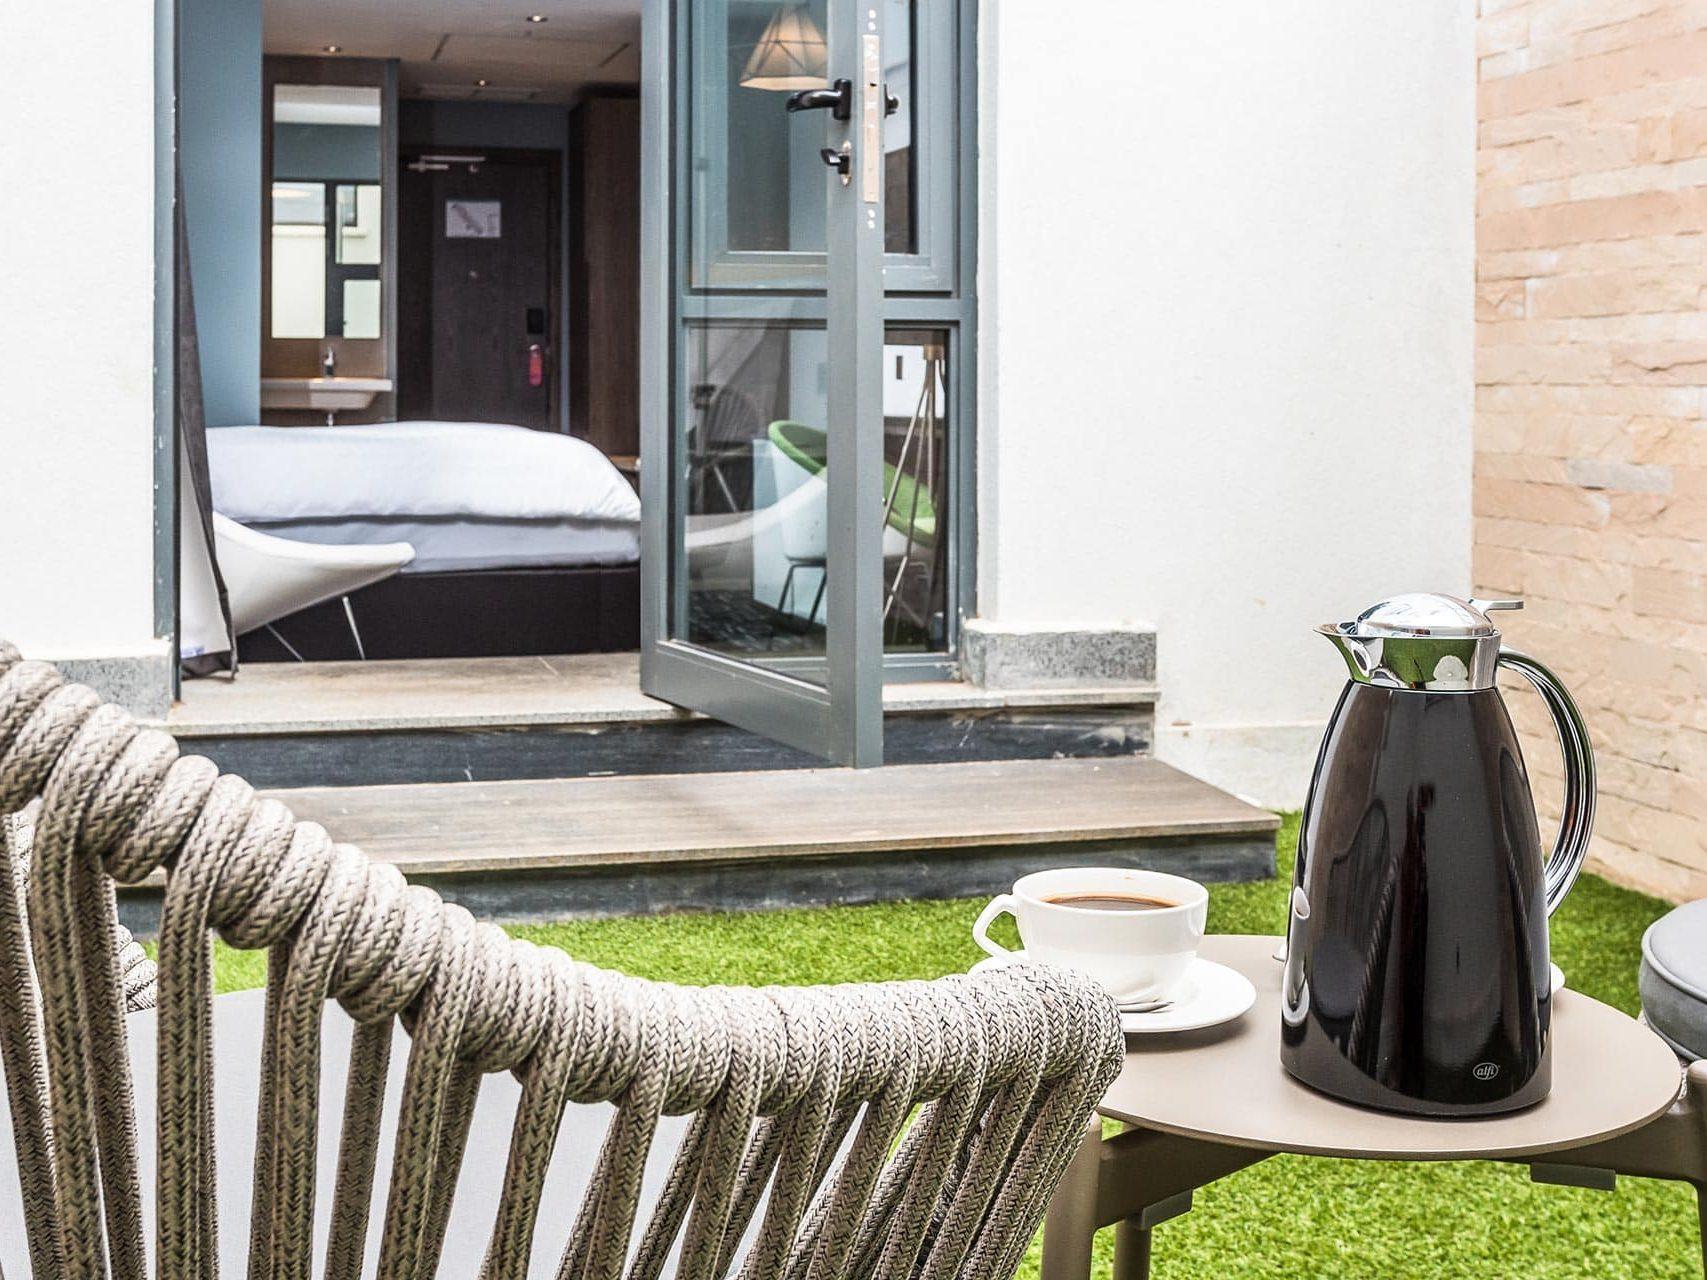 terrace king hotel nairobi 07